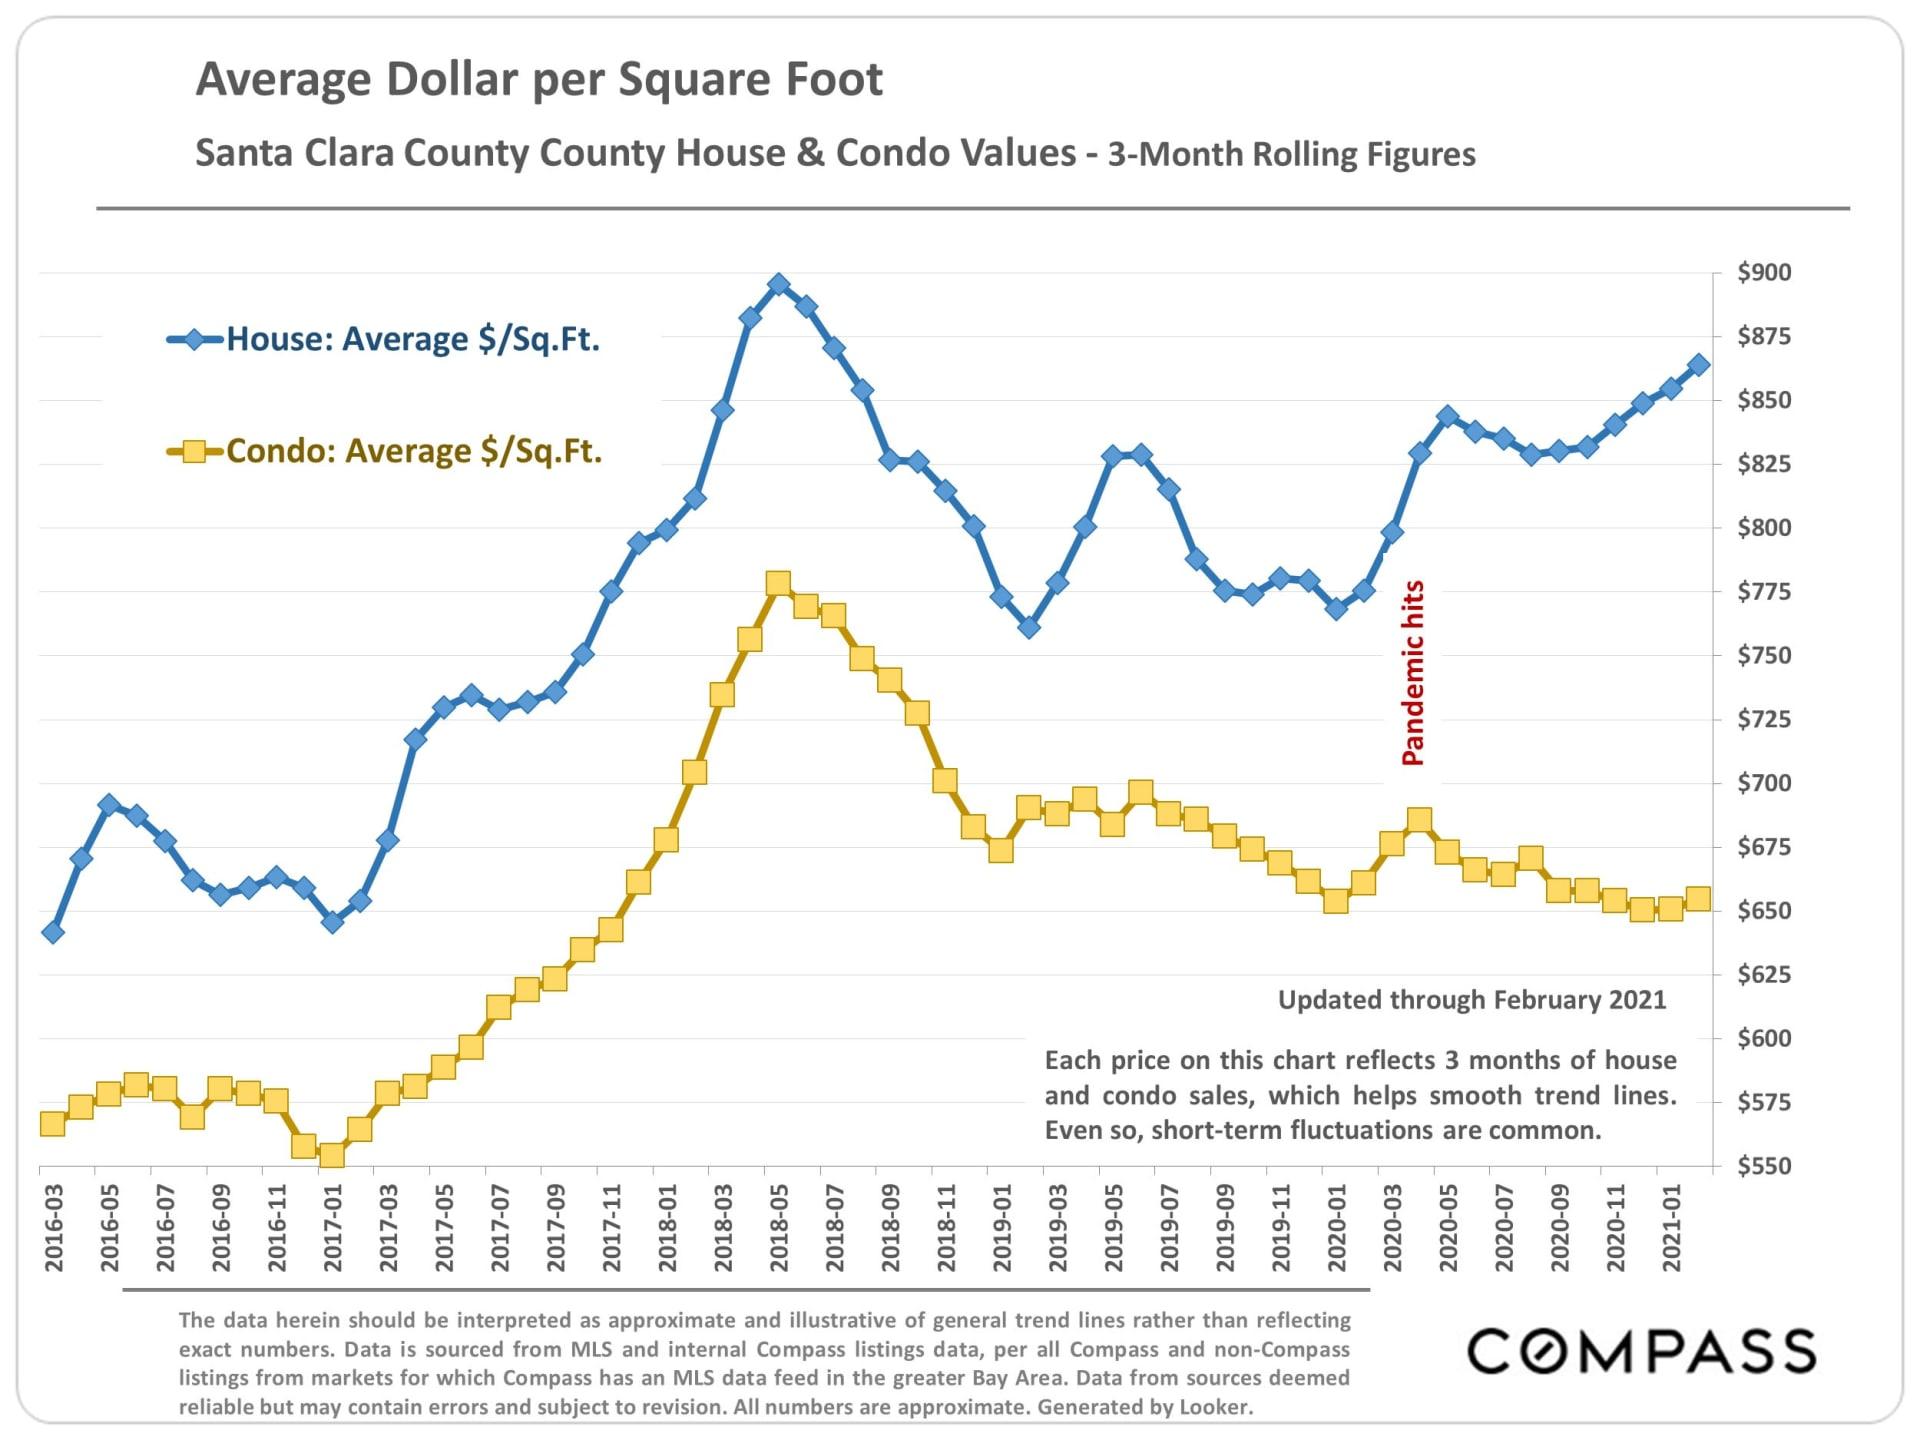 Market Update, March 2021. Santa Clara County